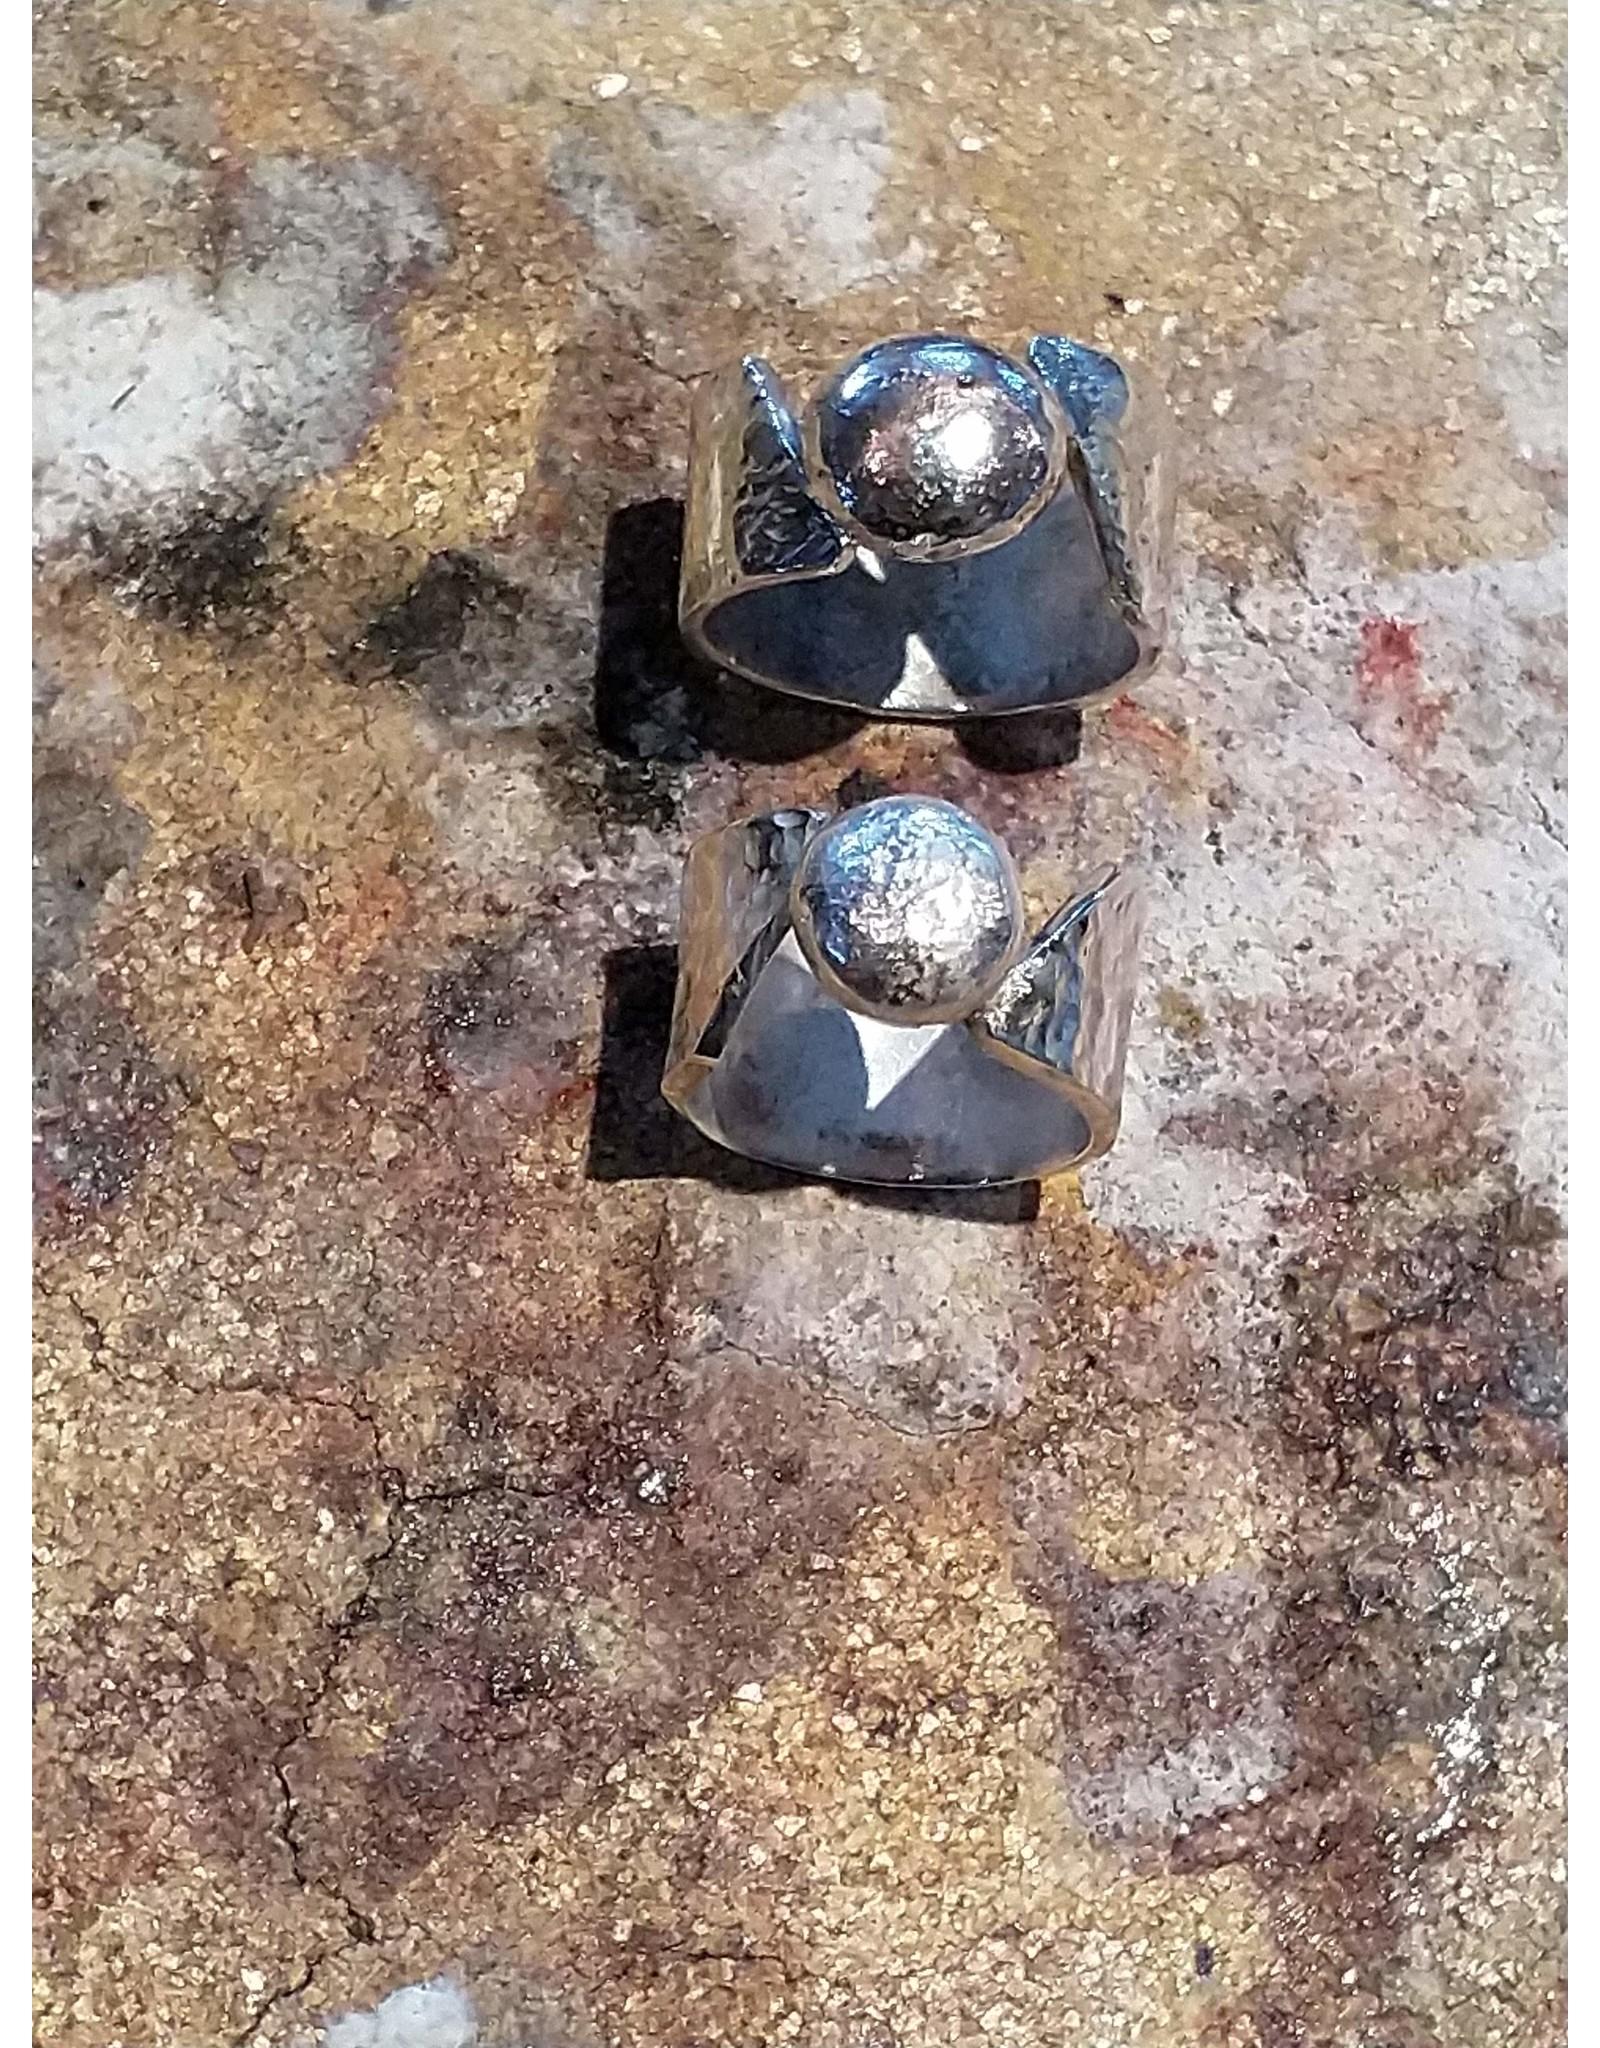 Workshop sterling silver ring or pendant